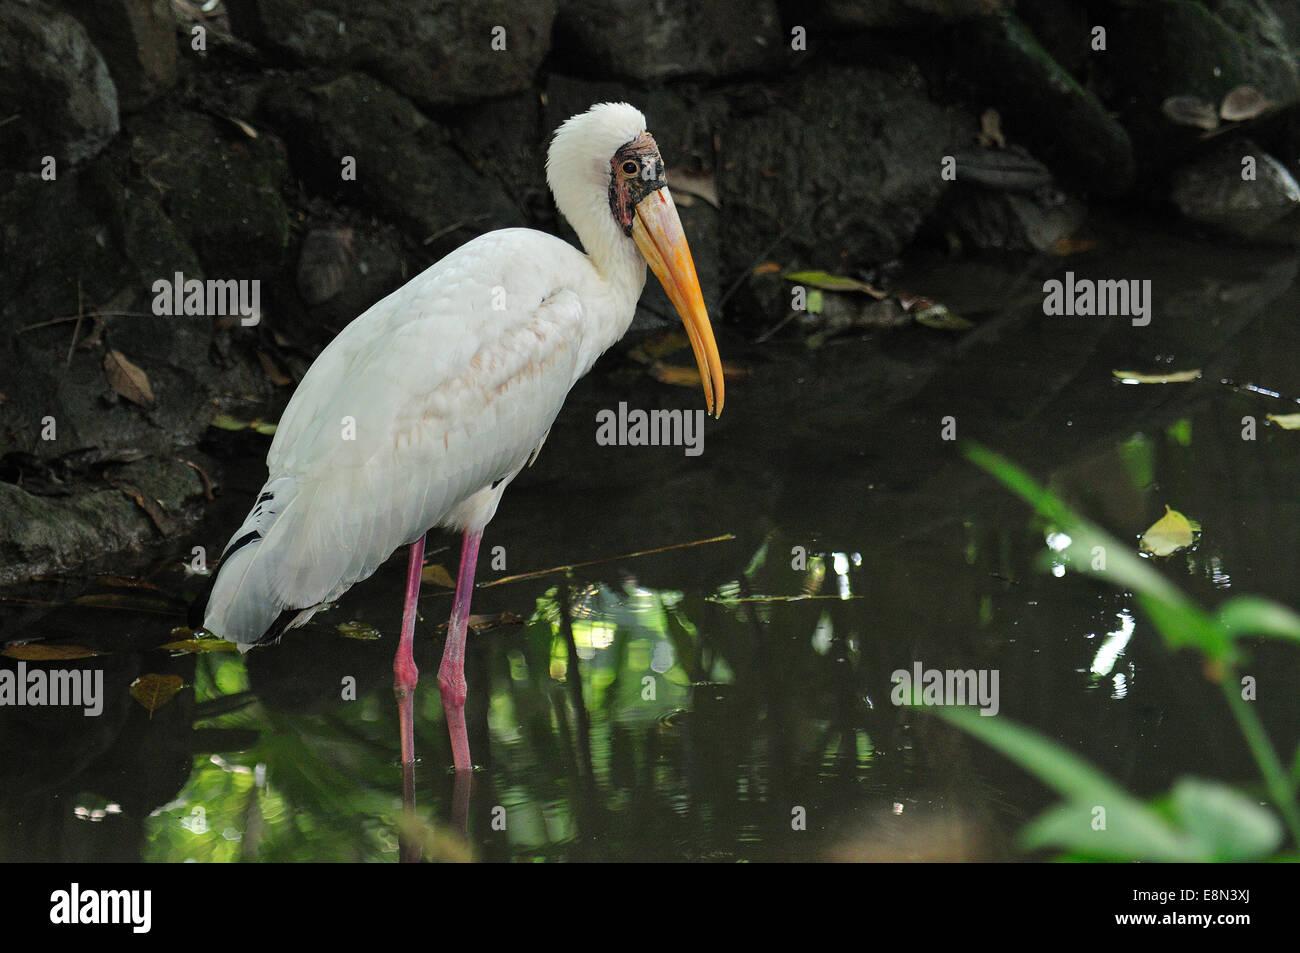 Yellow-billed stork Mycteria ibis, Ciconiidae, Africa Stock Photo